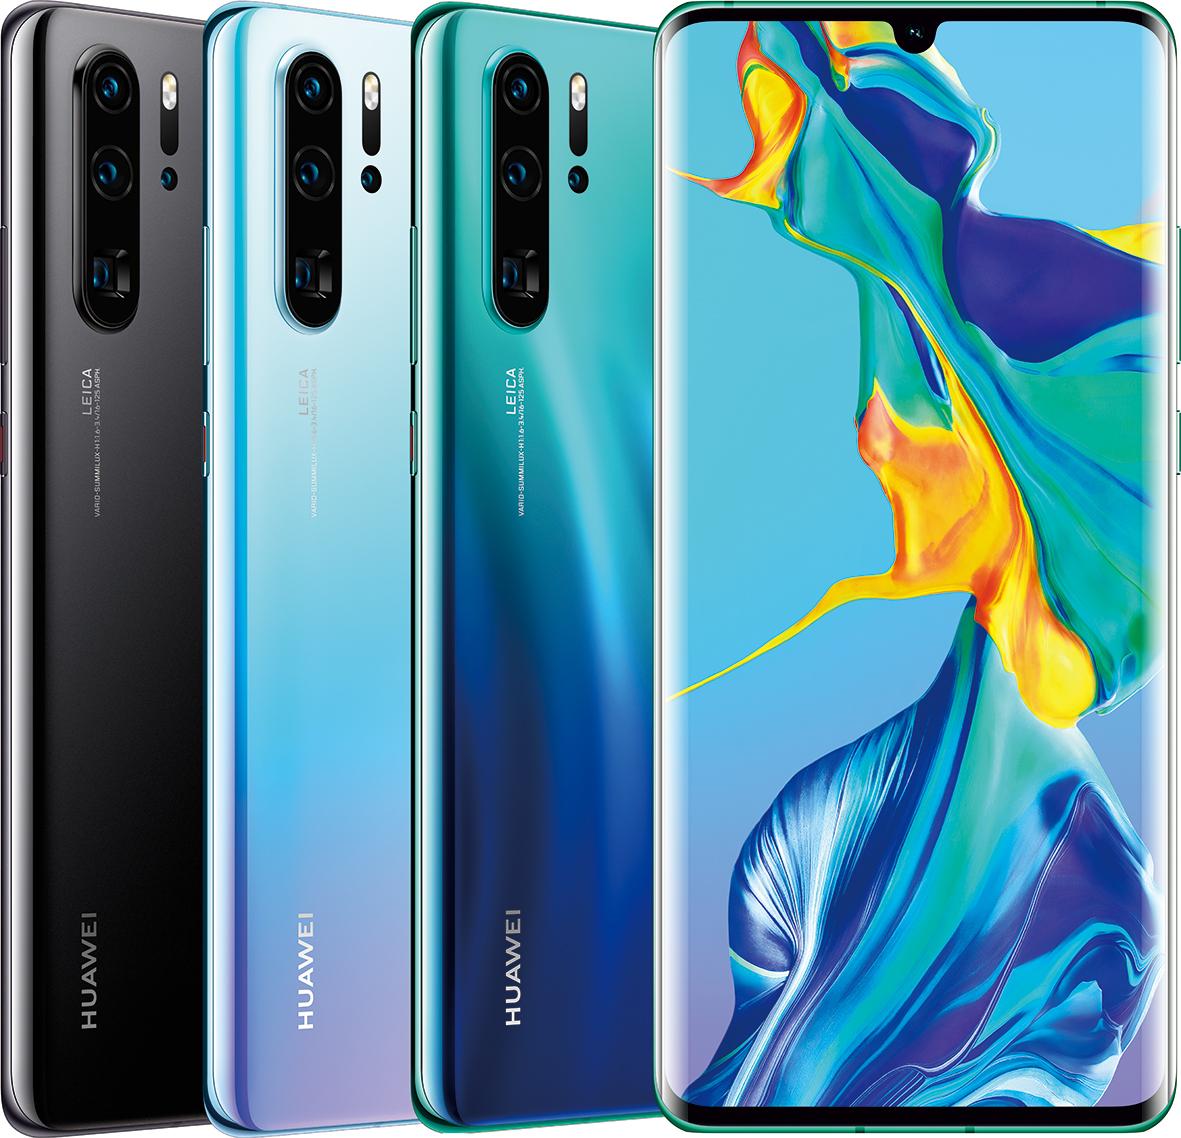 Huawei P30 lite - www.vodafone.co (4)